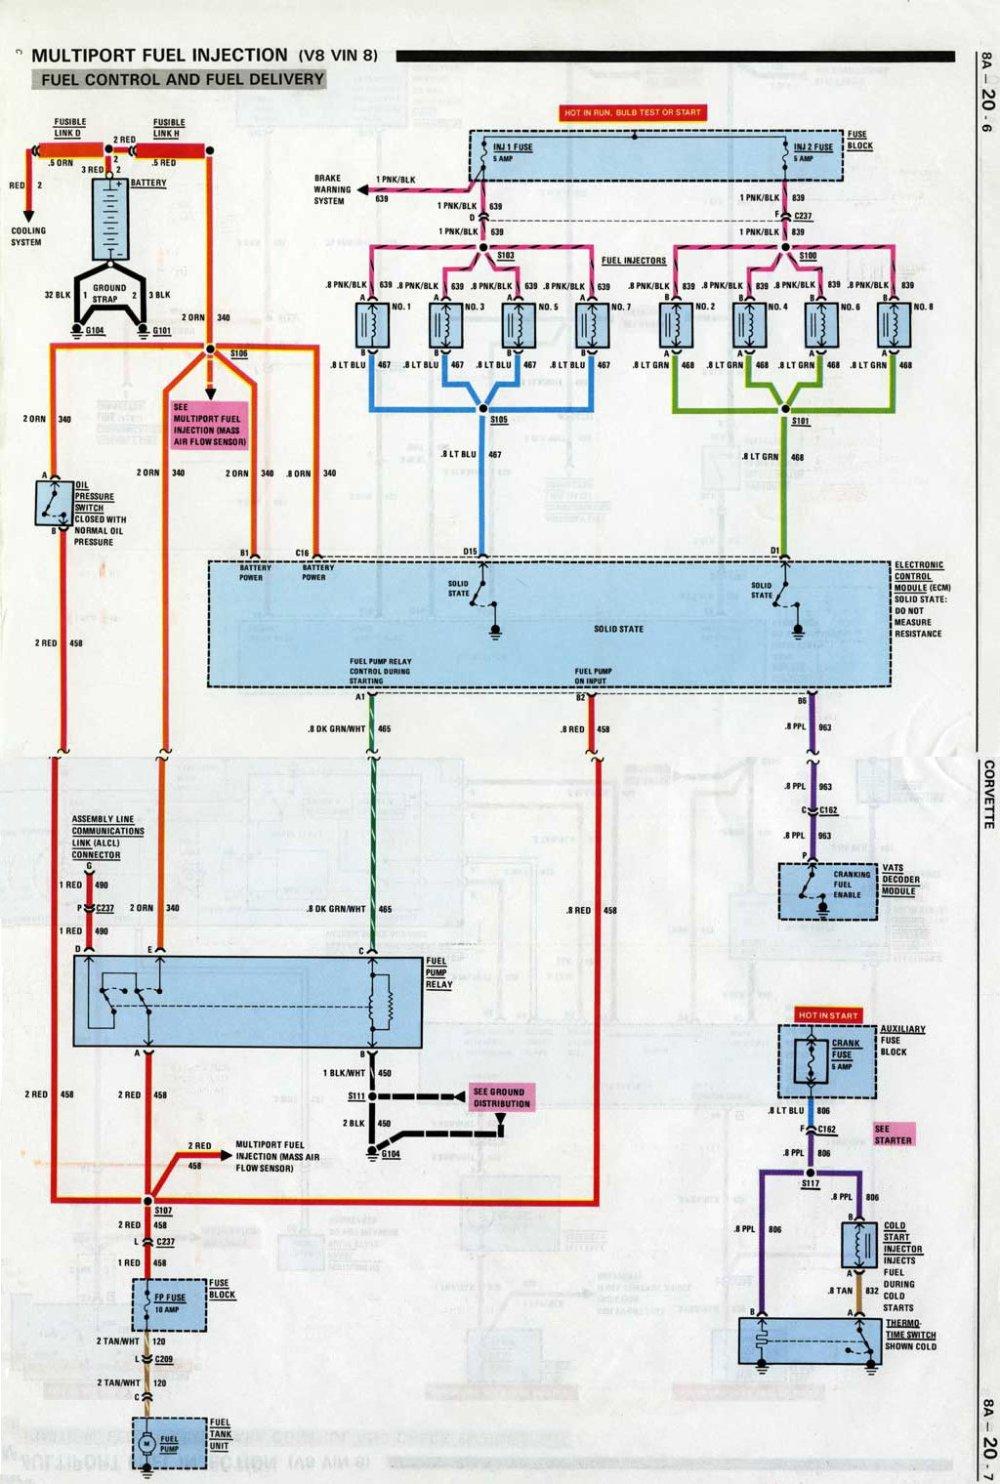 medium resolution of 94 corvette fuel pump wiring diagram wiring diagram split1984 corvette fuel pump wire harness wiring diagram